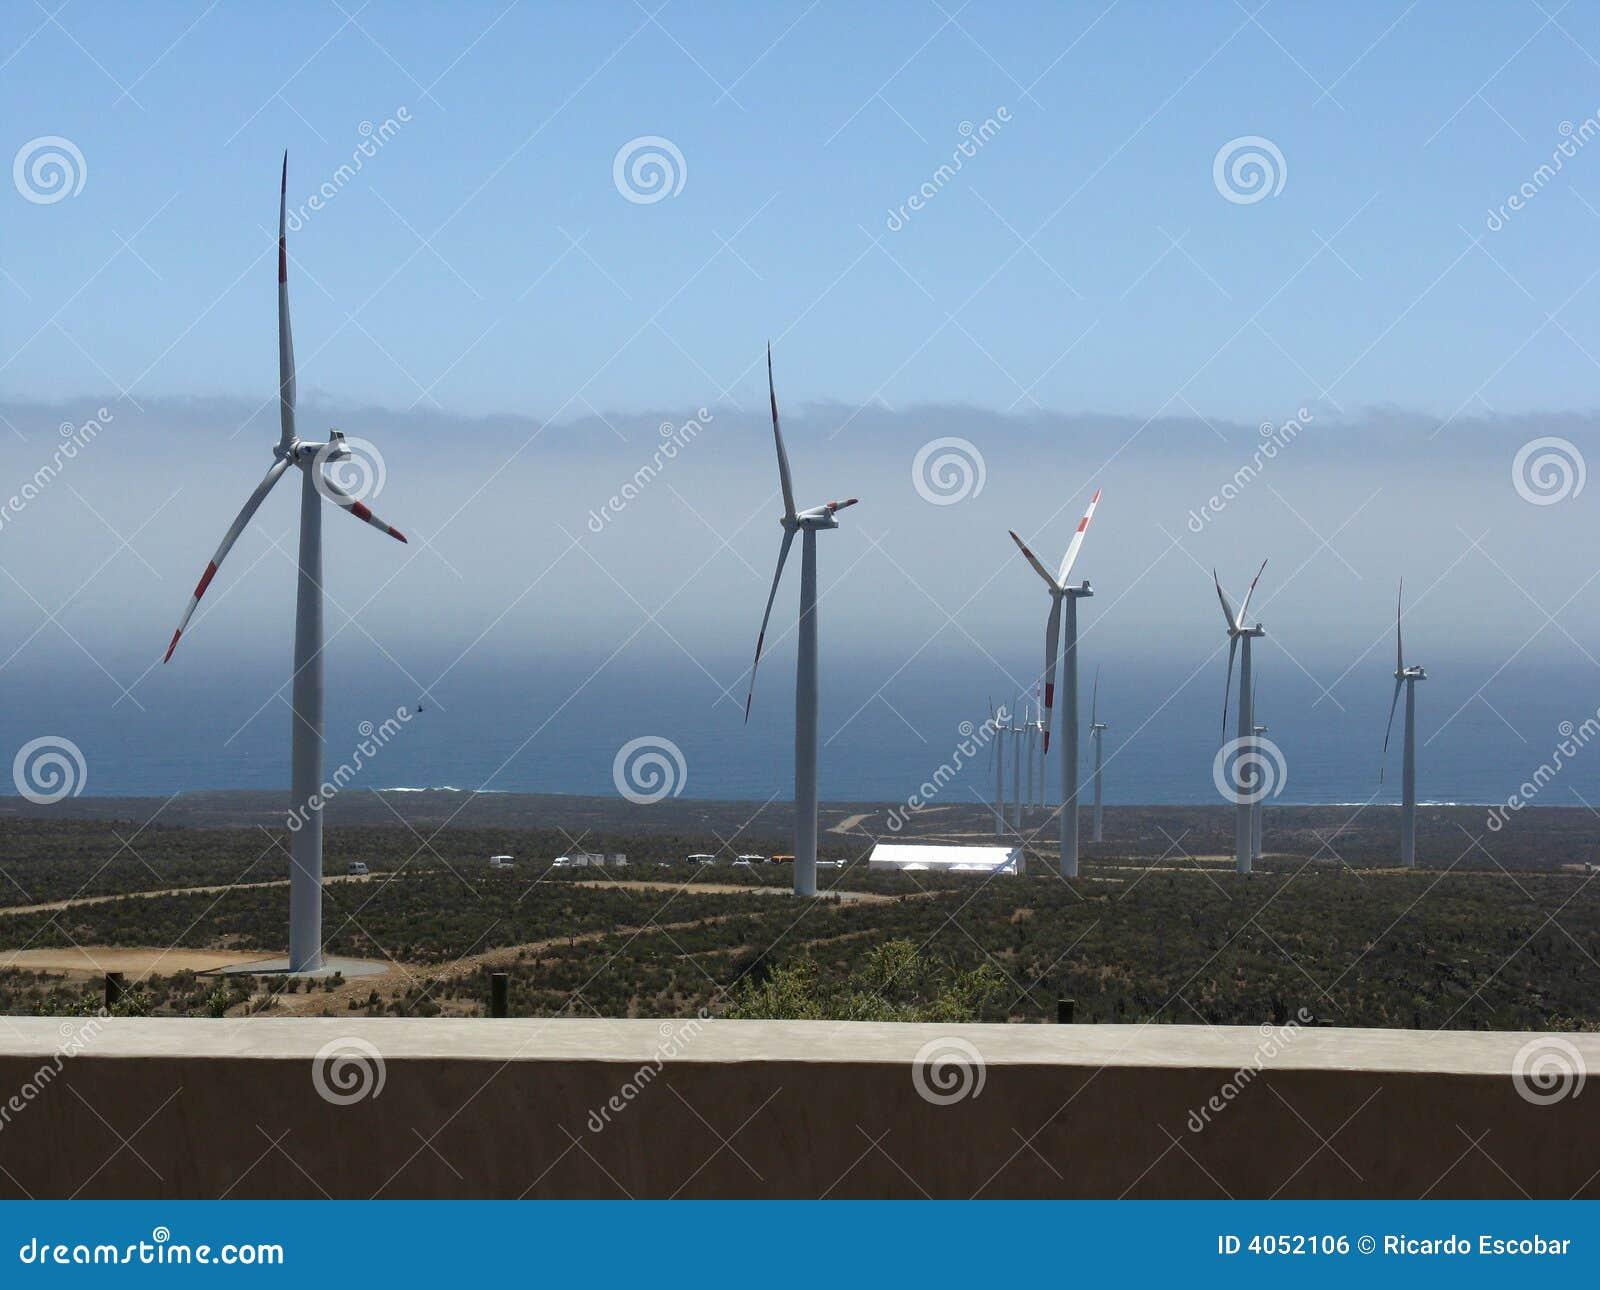 Fuerte viento